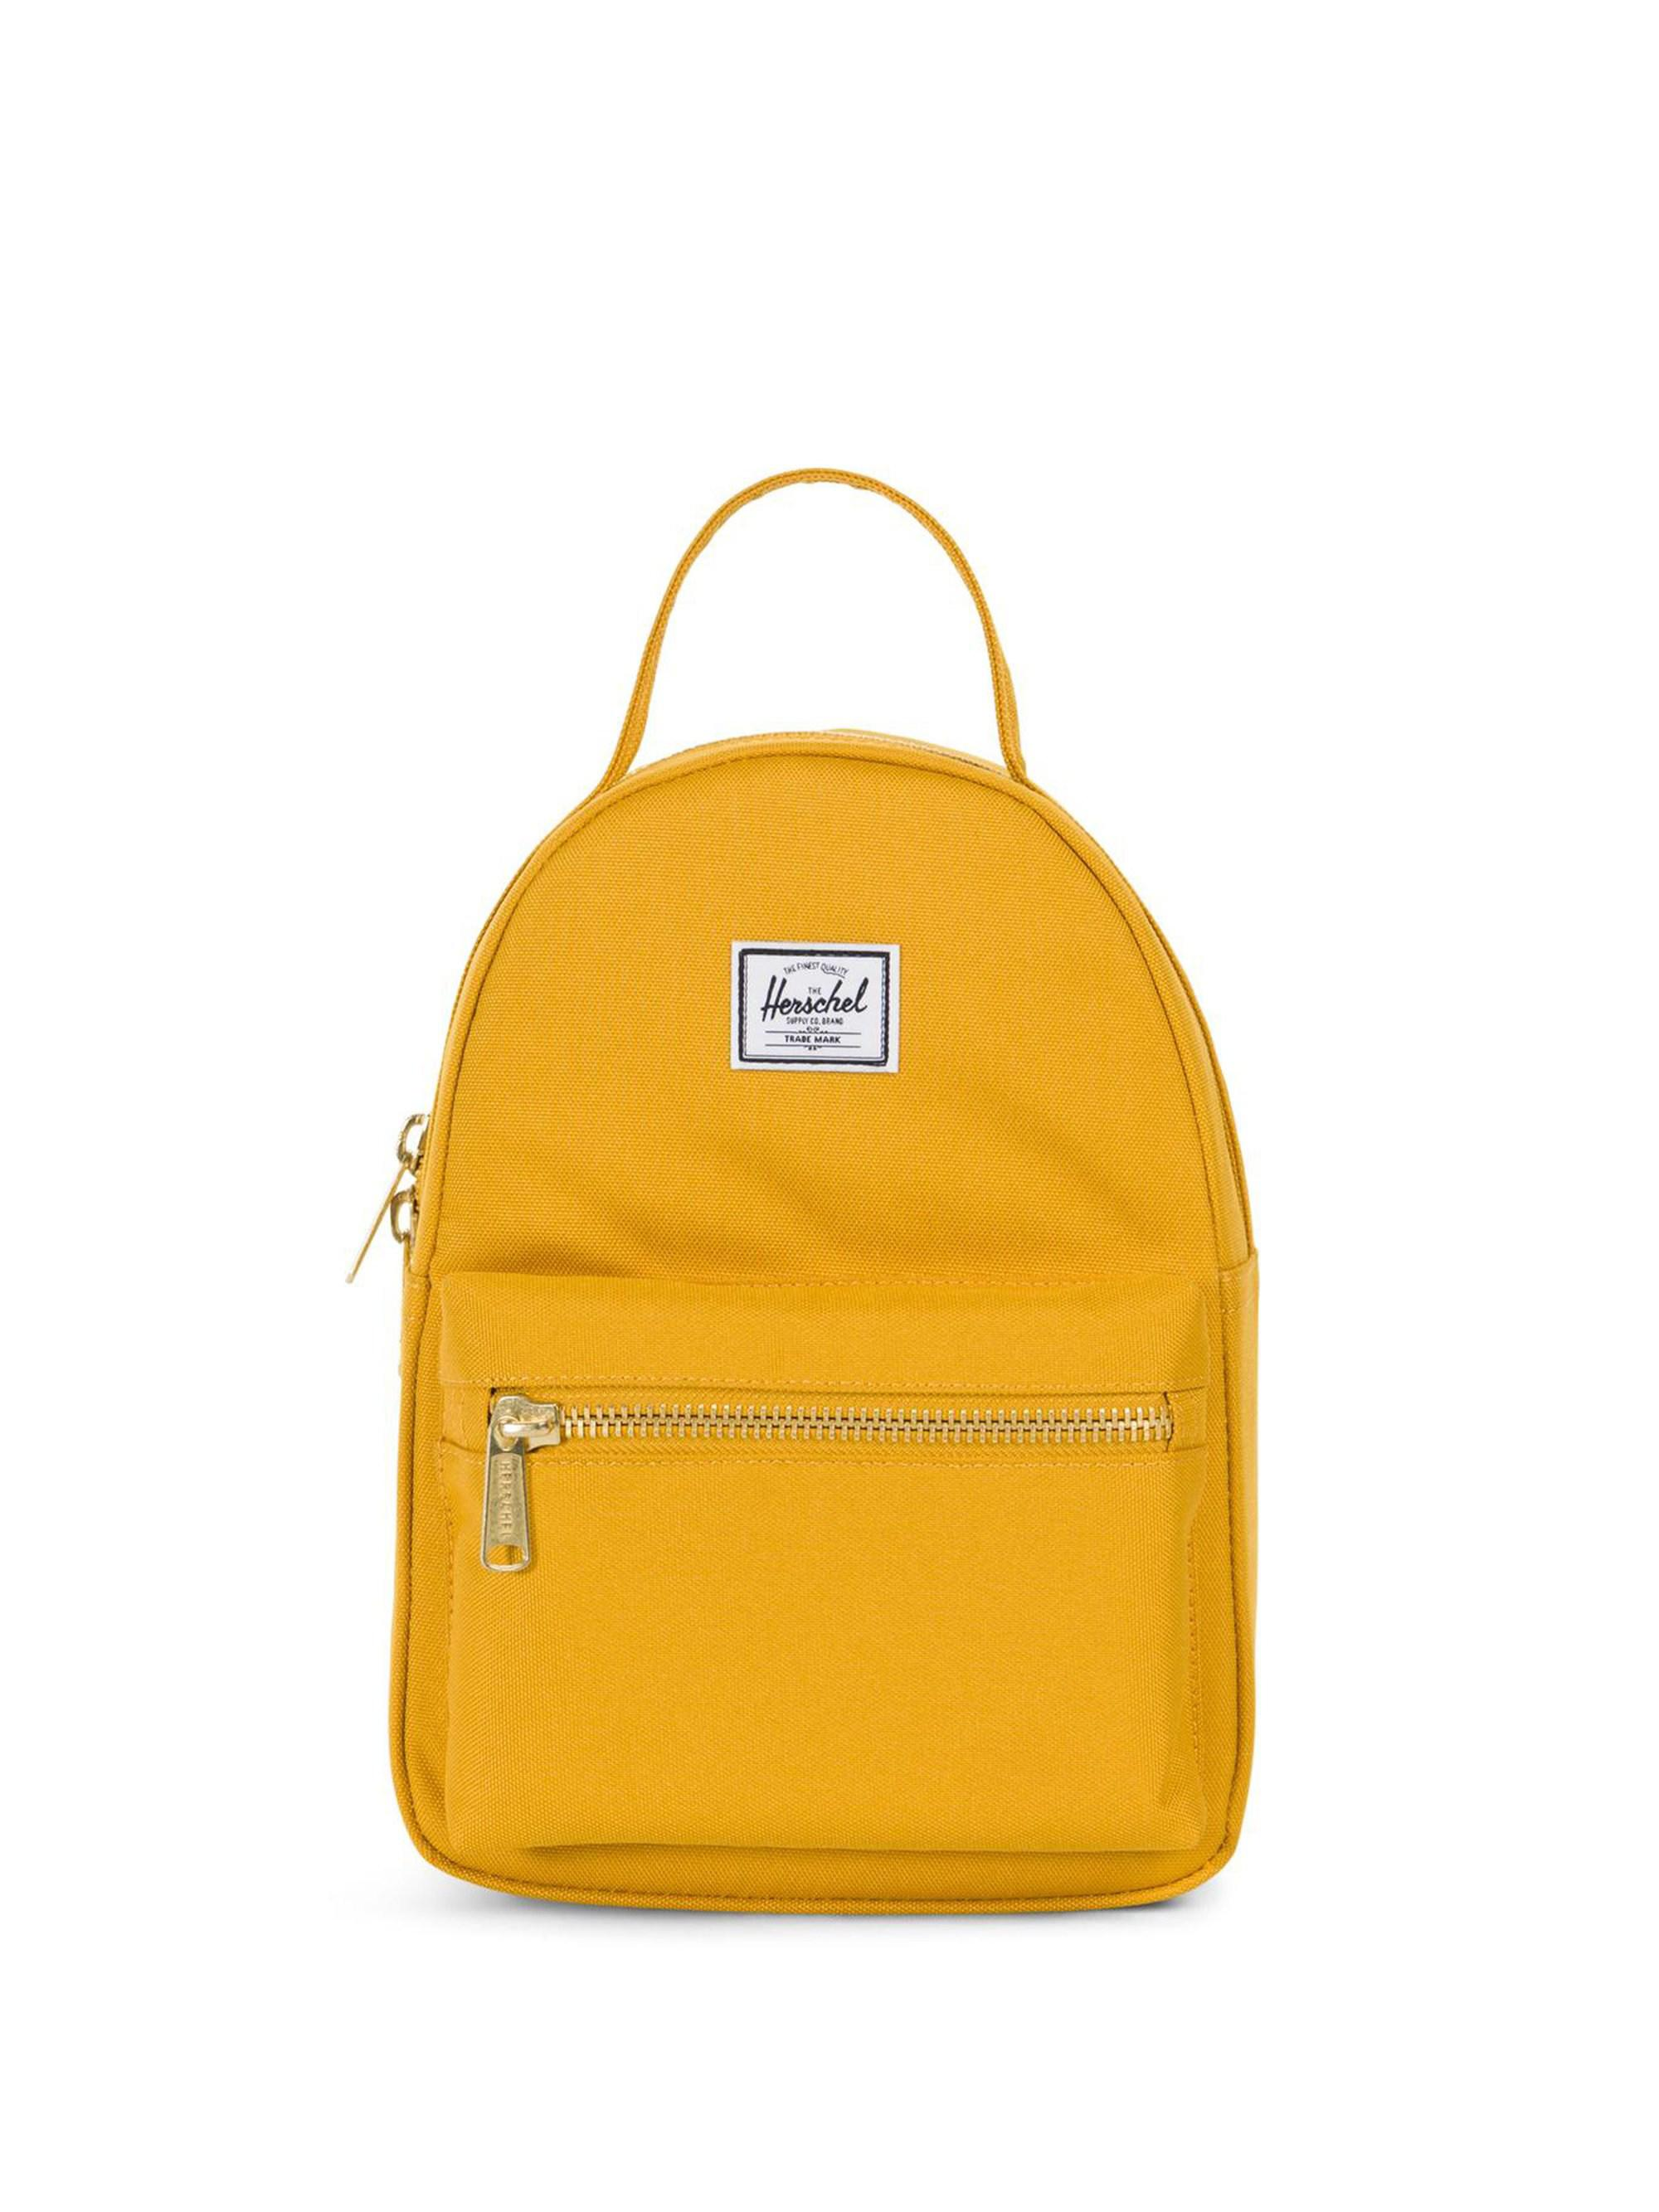 d61affcca90 Herschel Supply Co. Nova Mini Backpack in Yellow for Men - Save ...